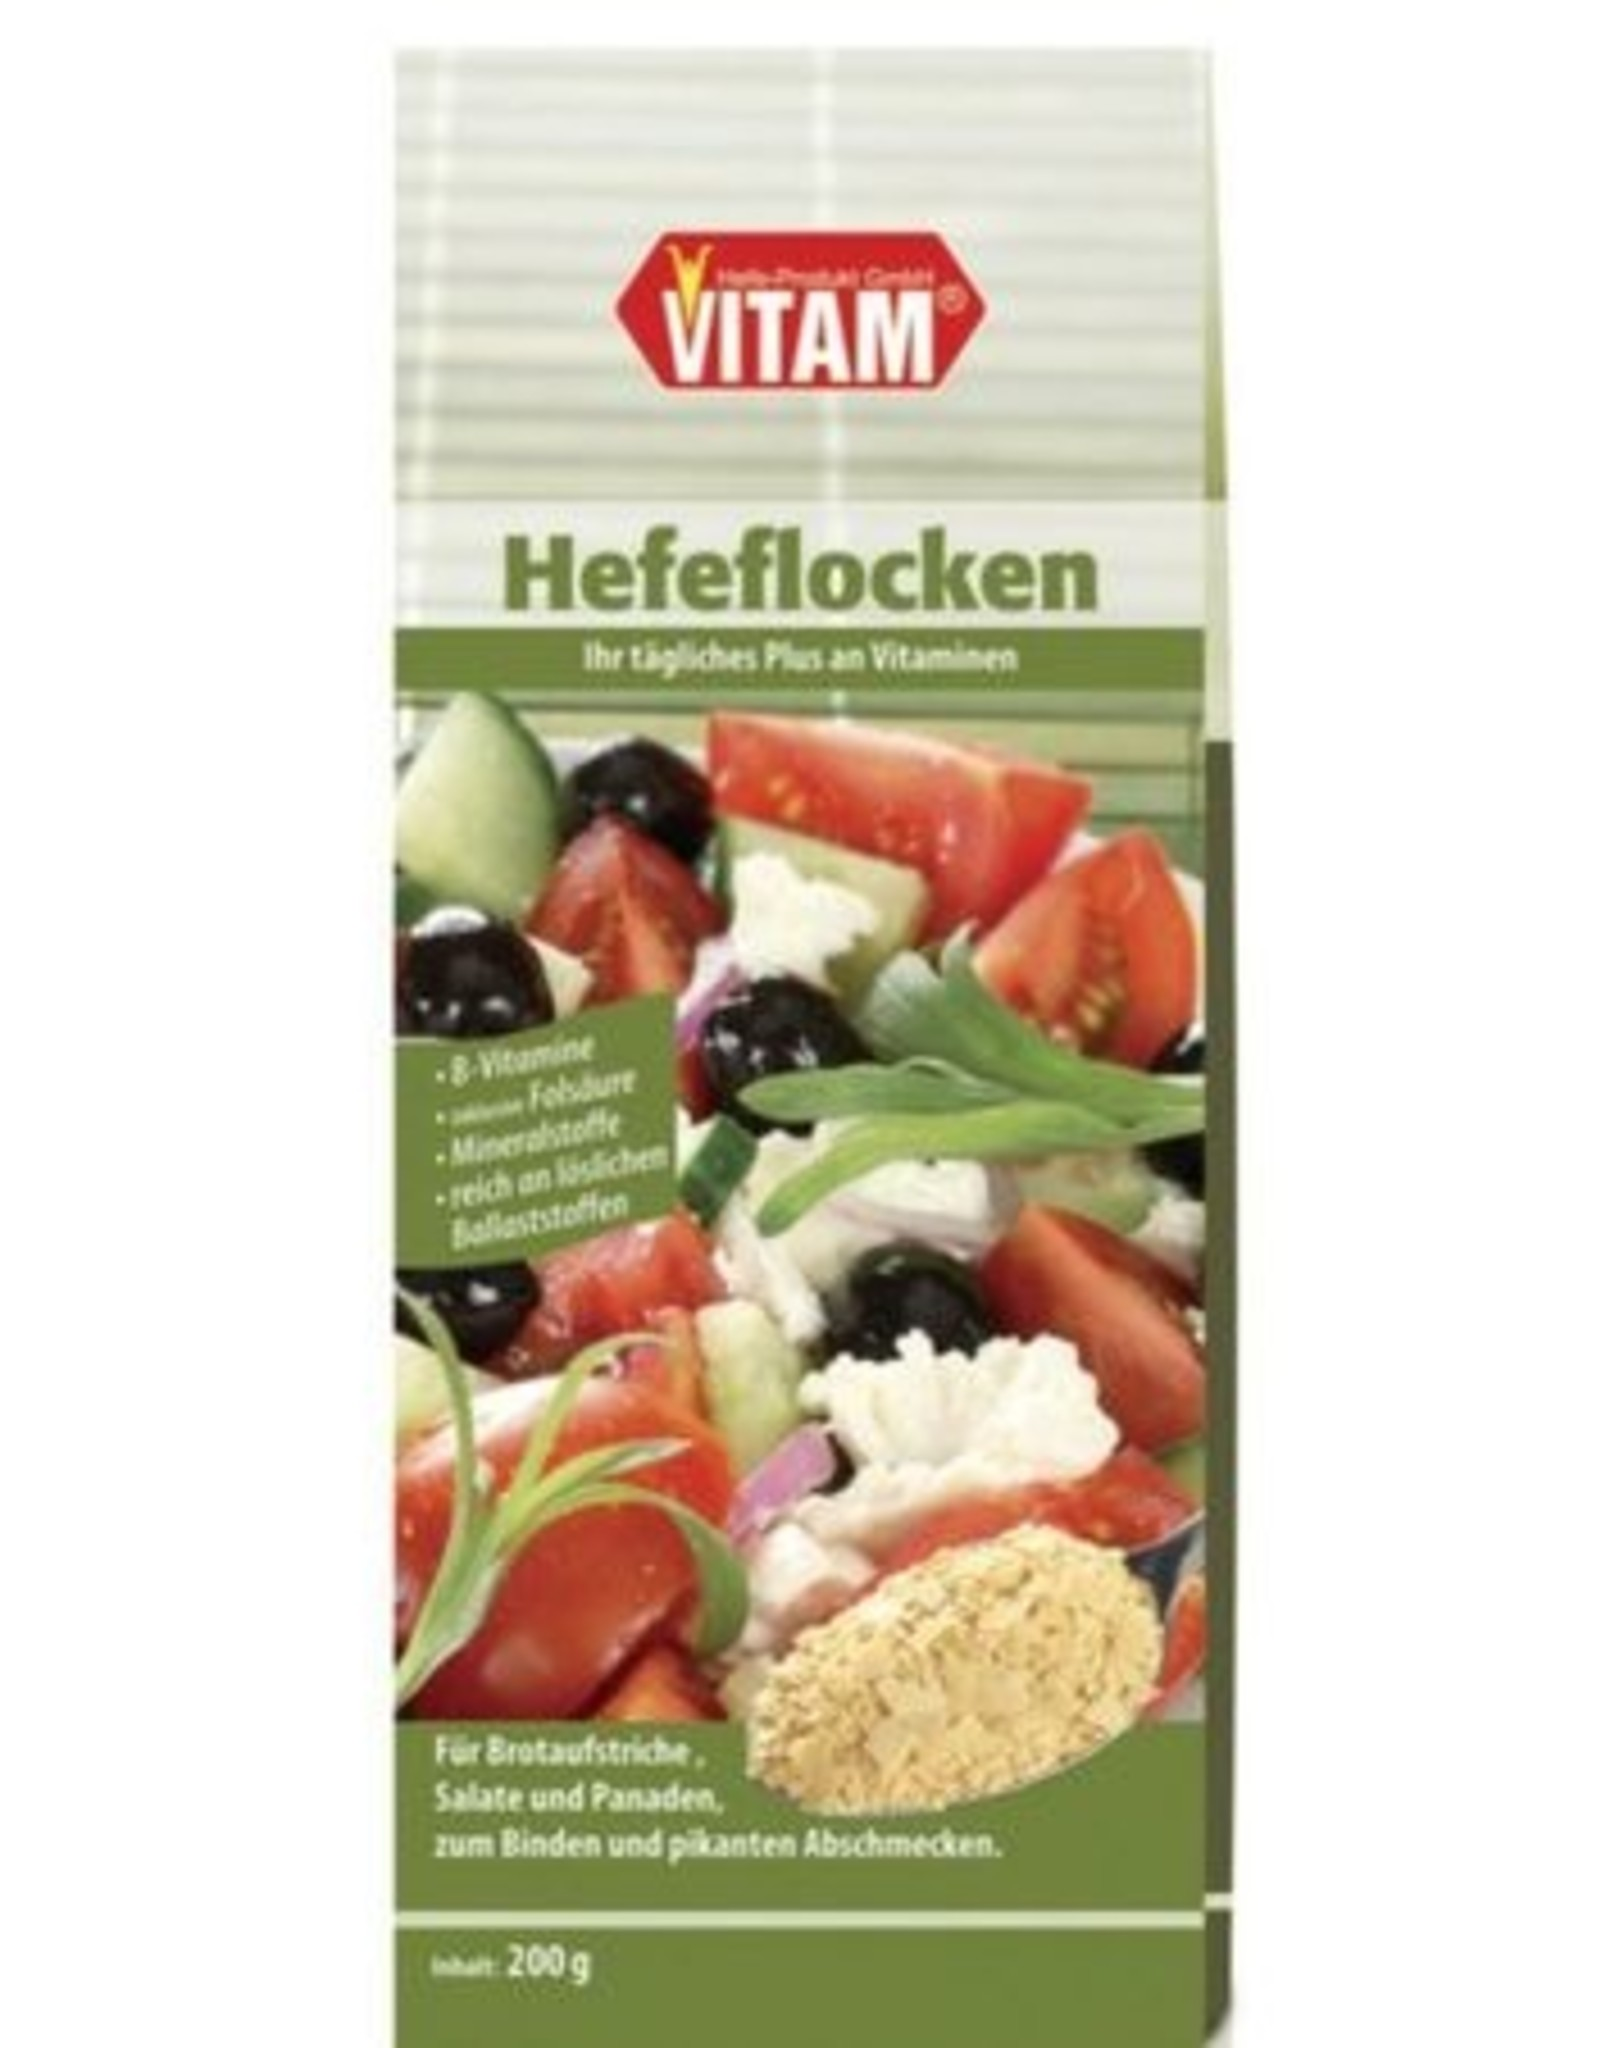 VITAM Hefeflocken salzfrei-natriumarm, 200g